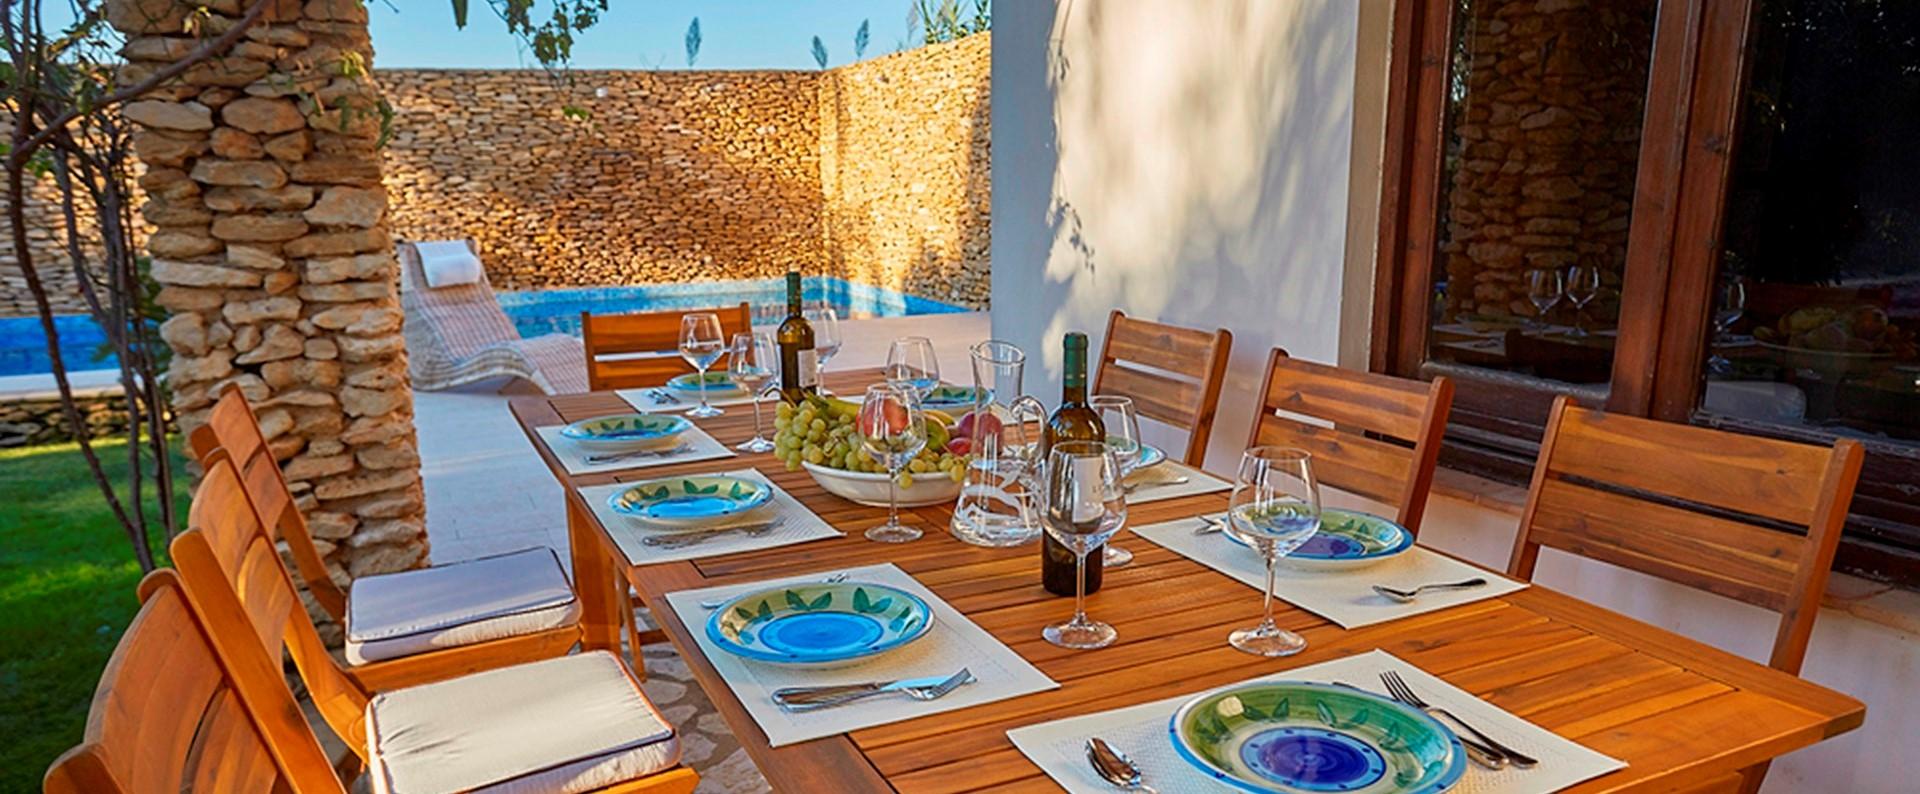 villa-selinunte-sicily-dining-terrace